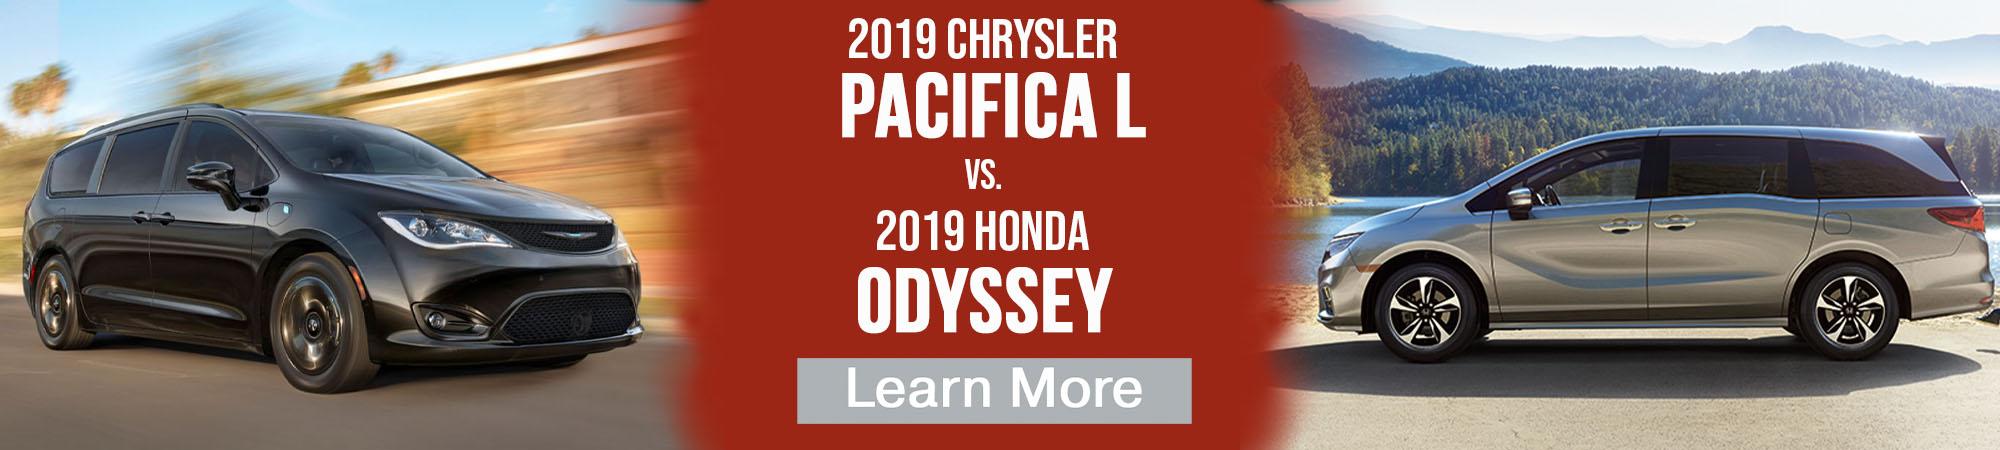 2019 Chrysler Pacifica vs 2019 Honda Odyssey